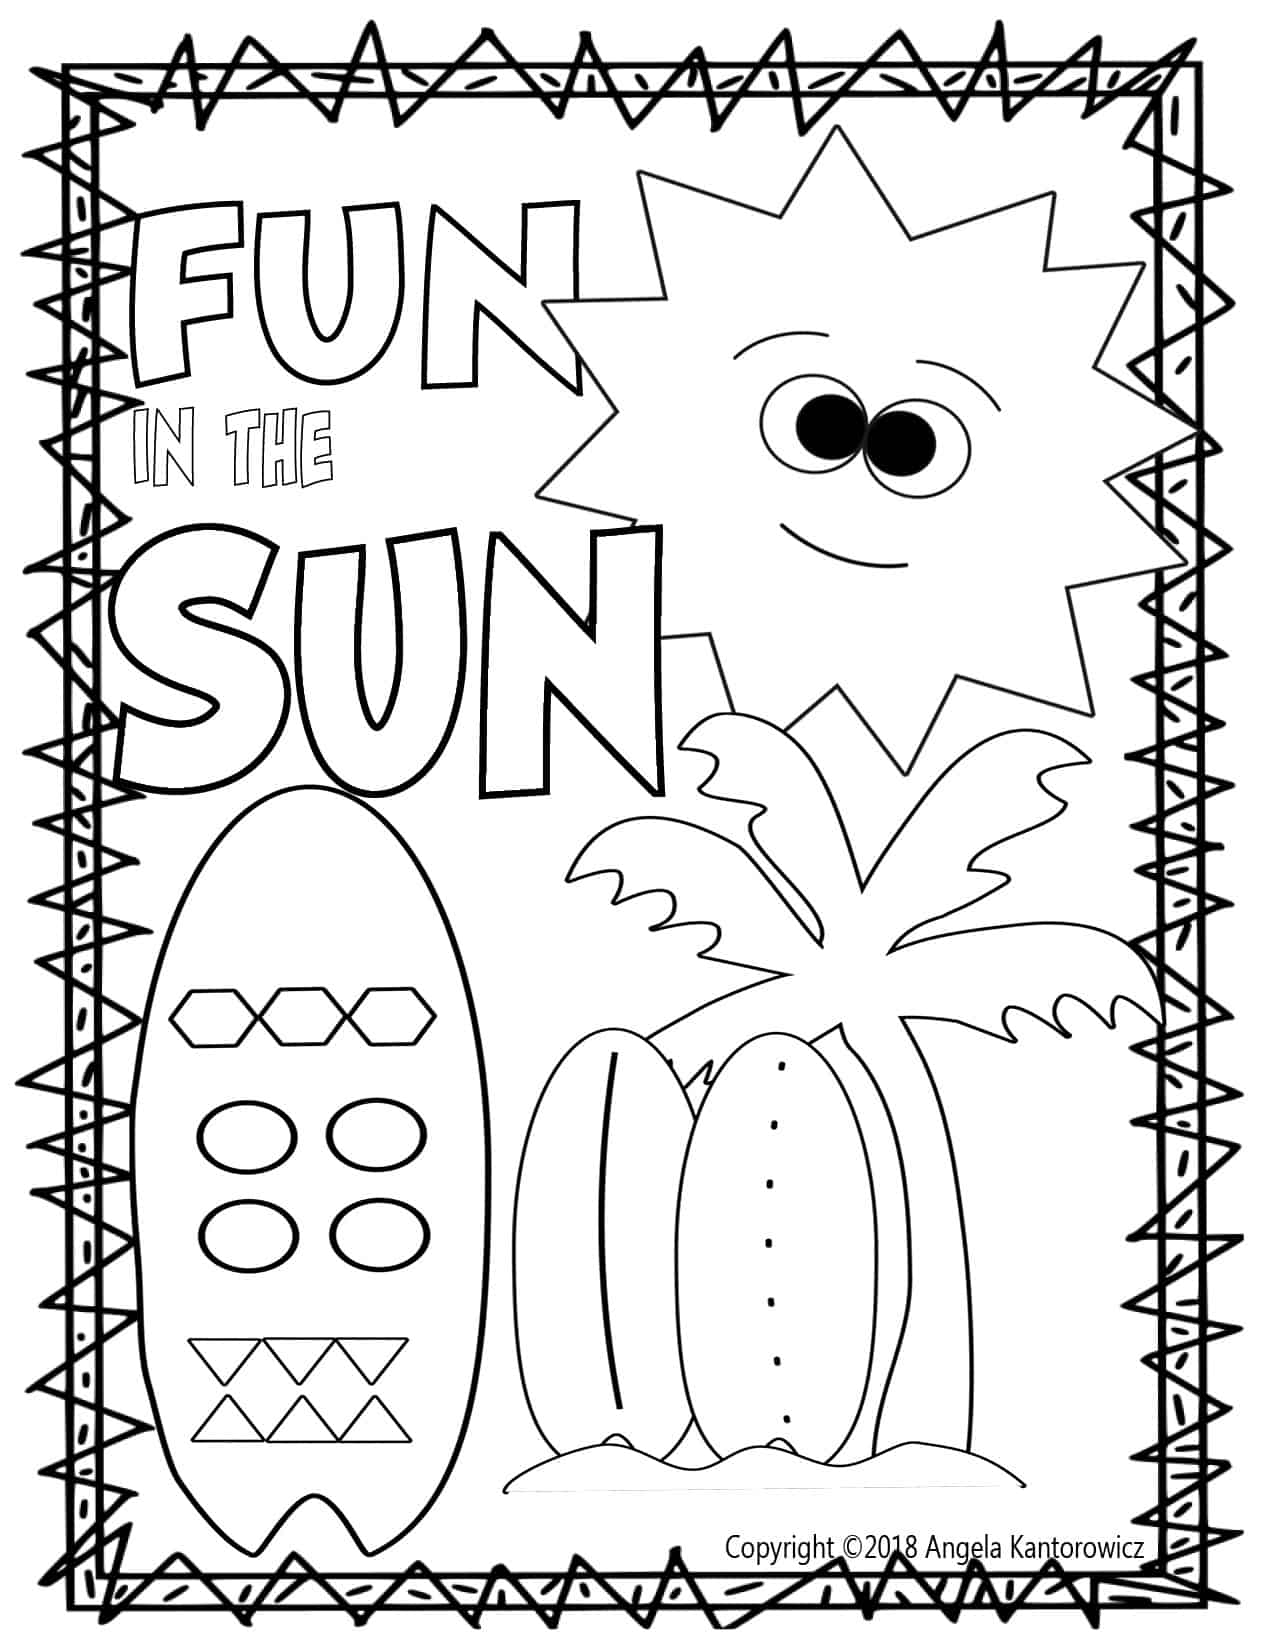 Fun In The Sun Color Sheet Making The Basics Fun